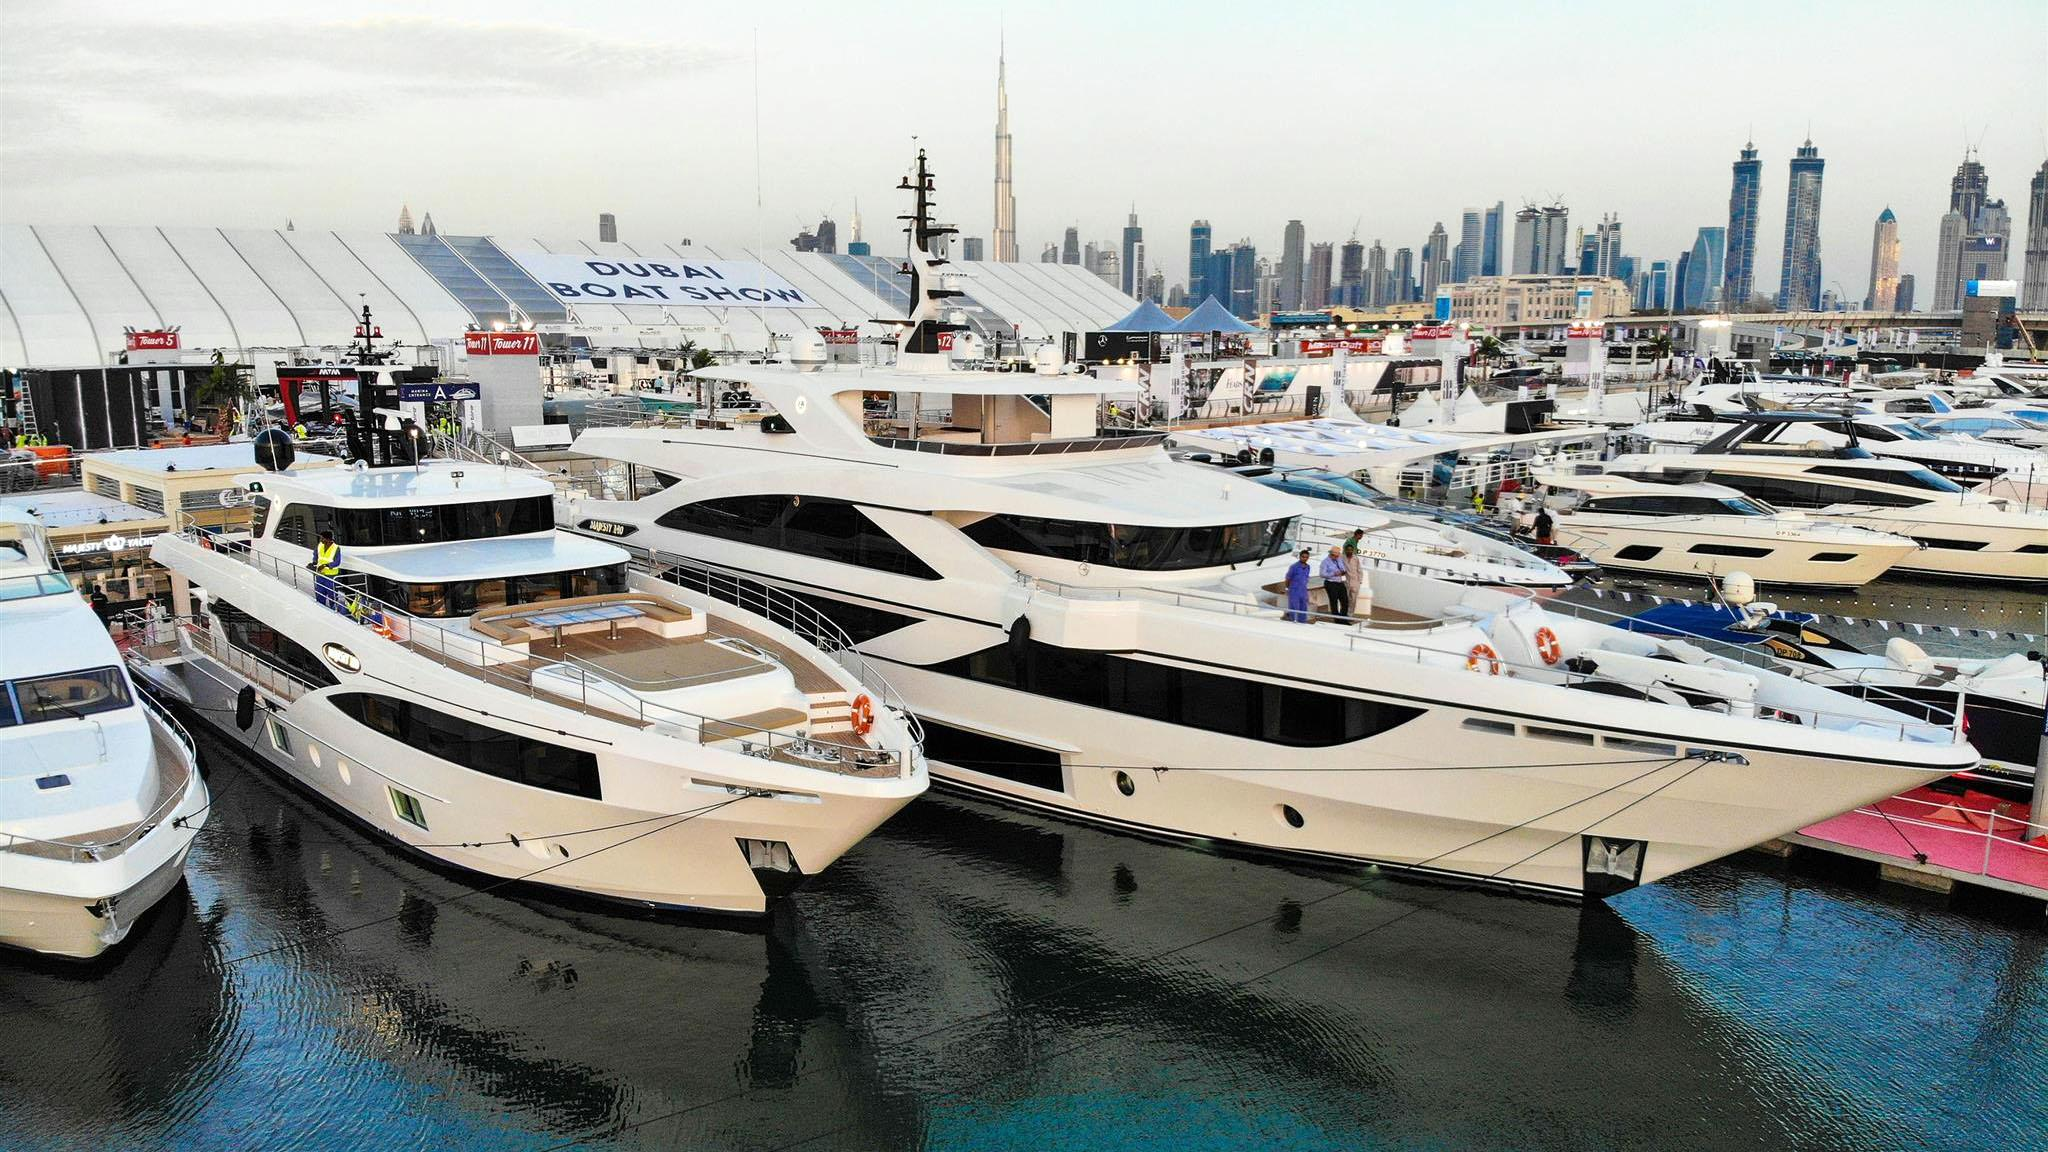 cest la vie majesty 140 motoryacht gulf craft 43m 2018 debut dibs